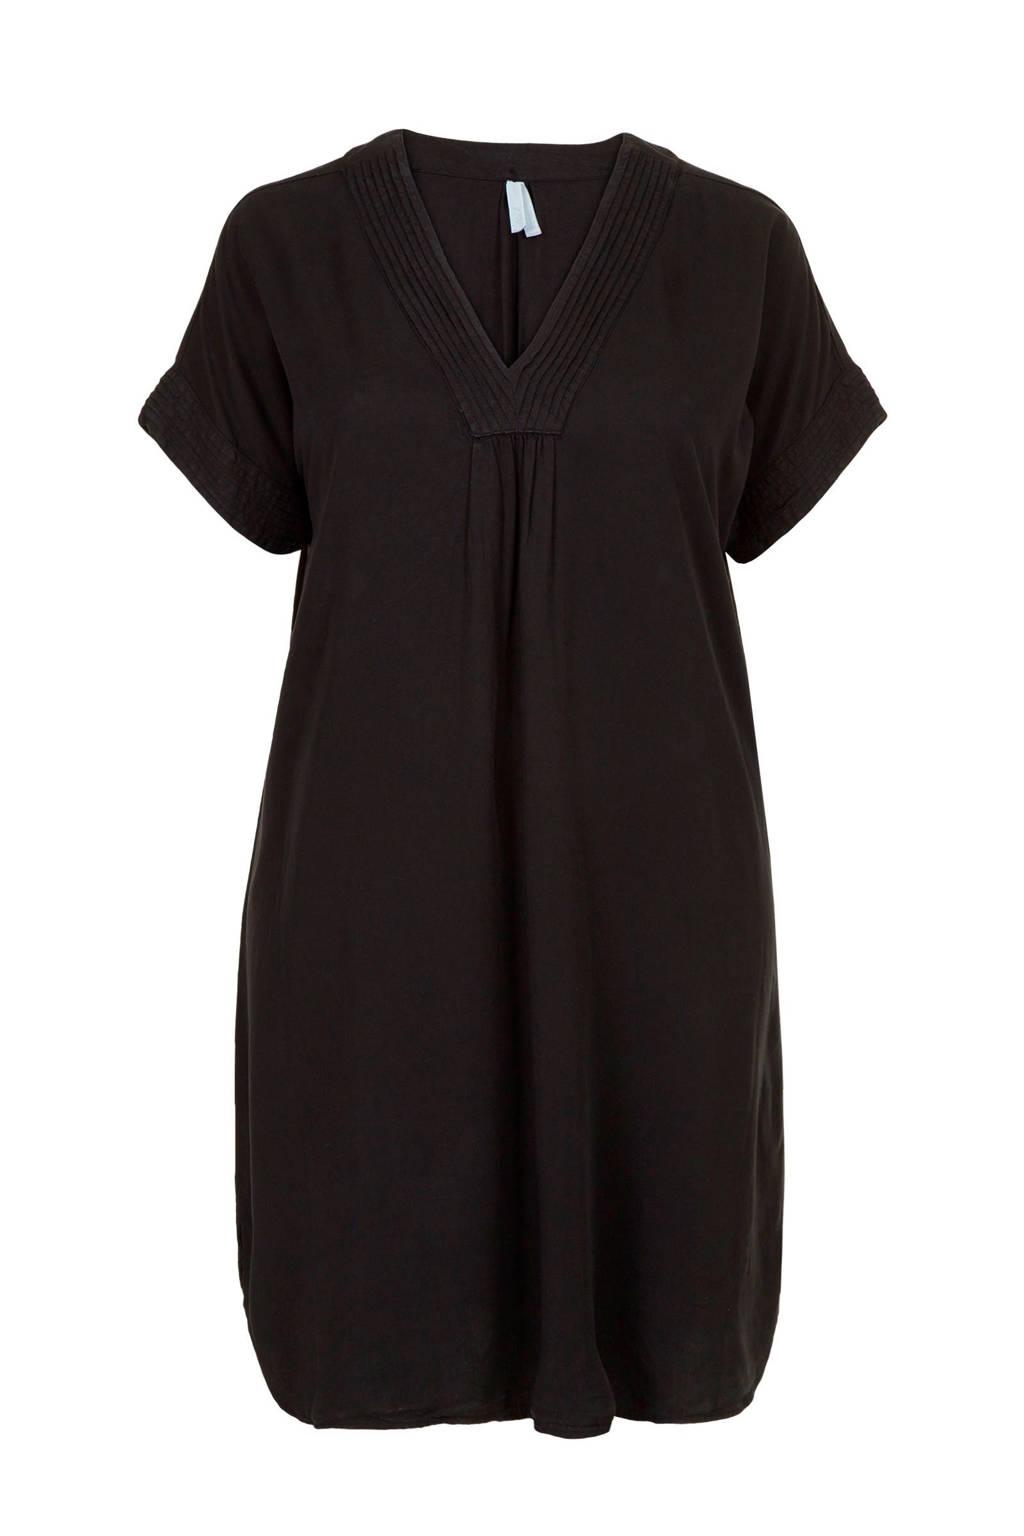 Miss Etam Plus jurk met plooien zwart, Zwart